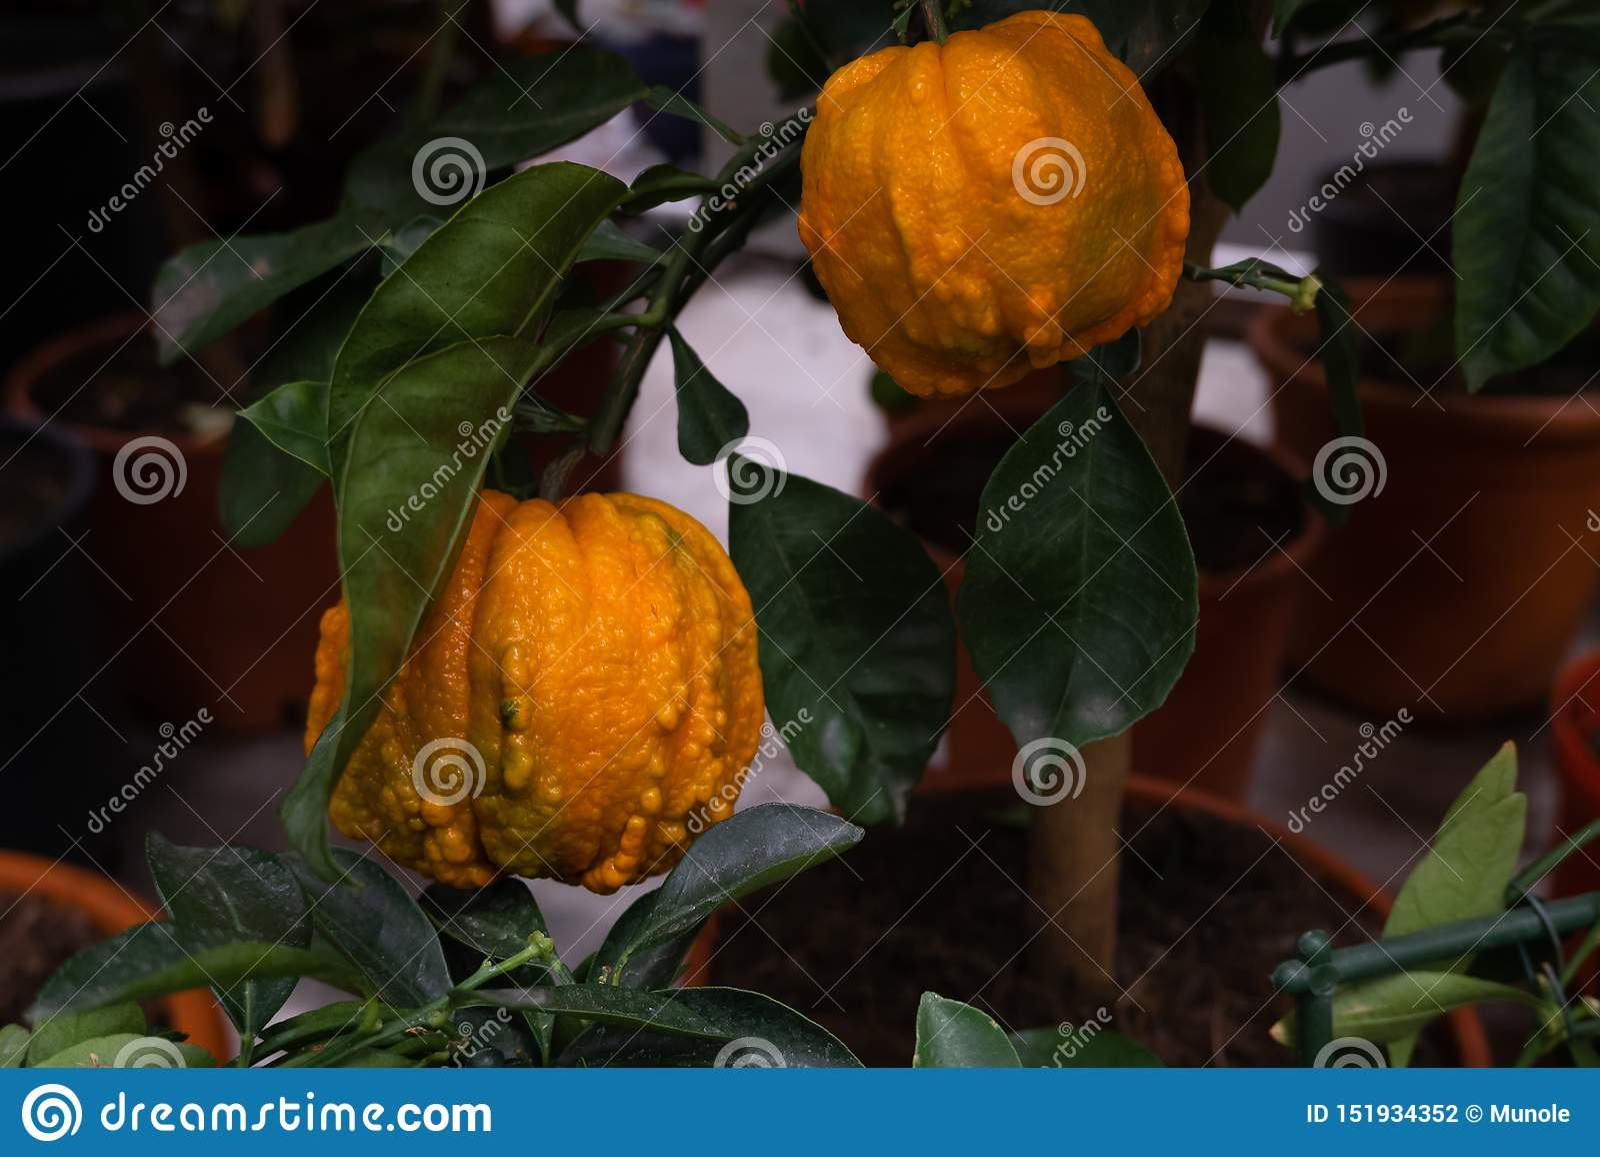 Klimpig orange frukt två